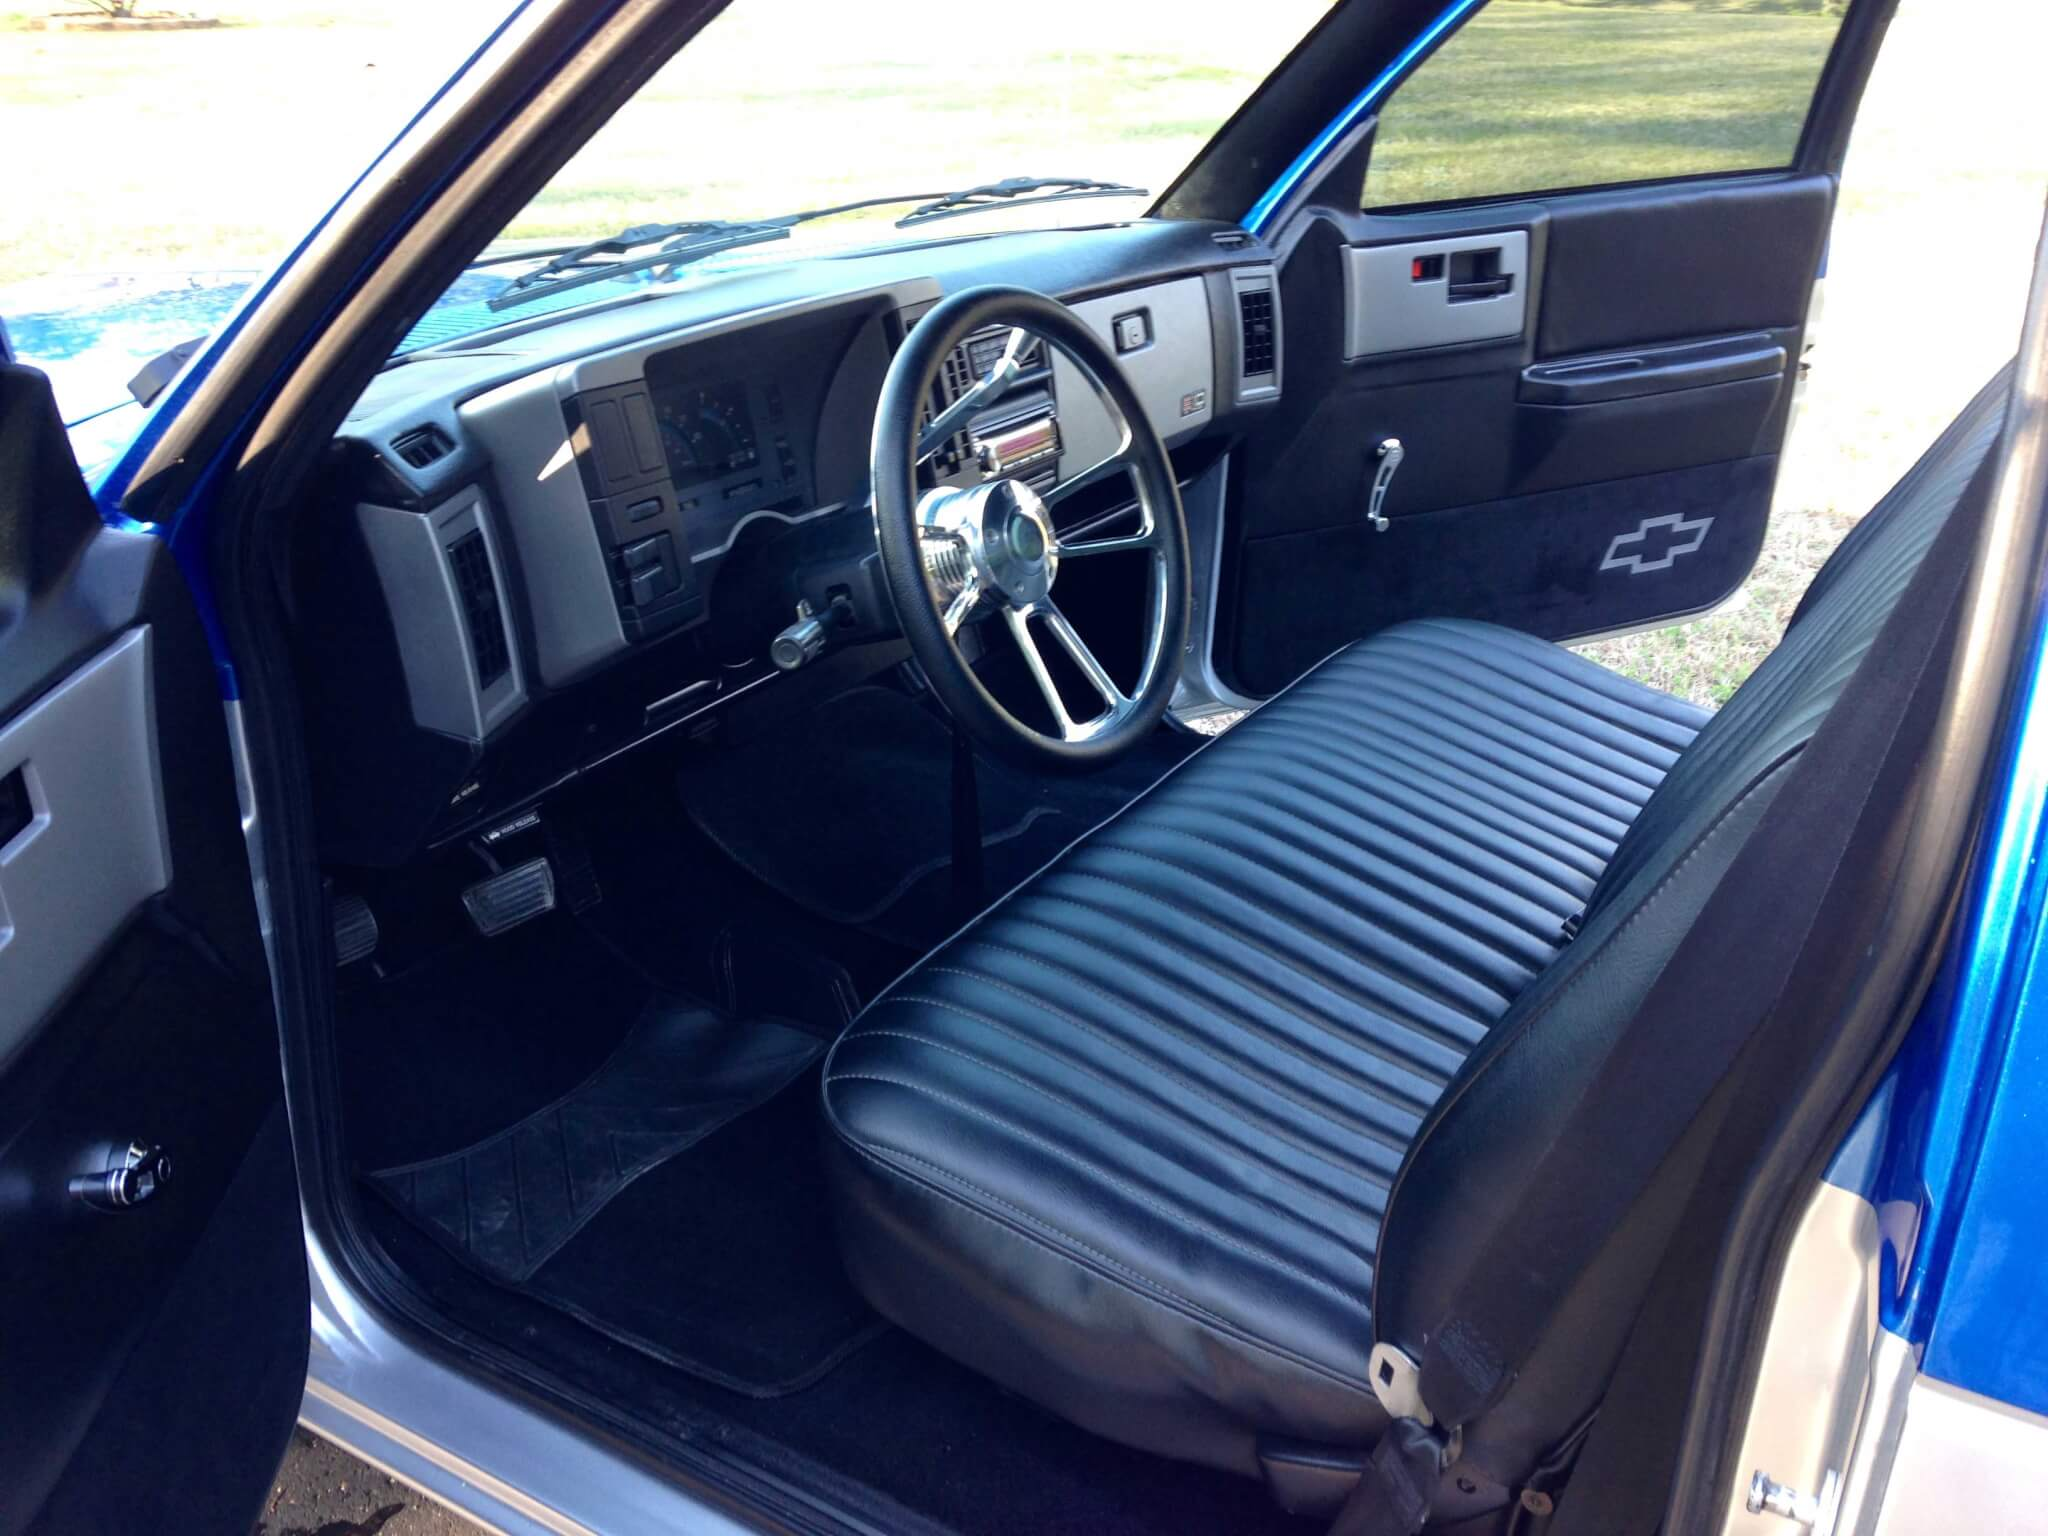 1992 Chevy S10 Interior Parts